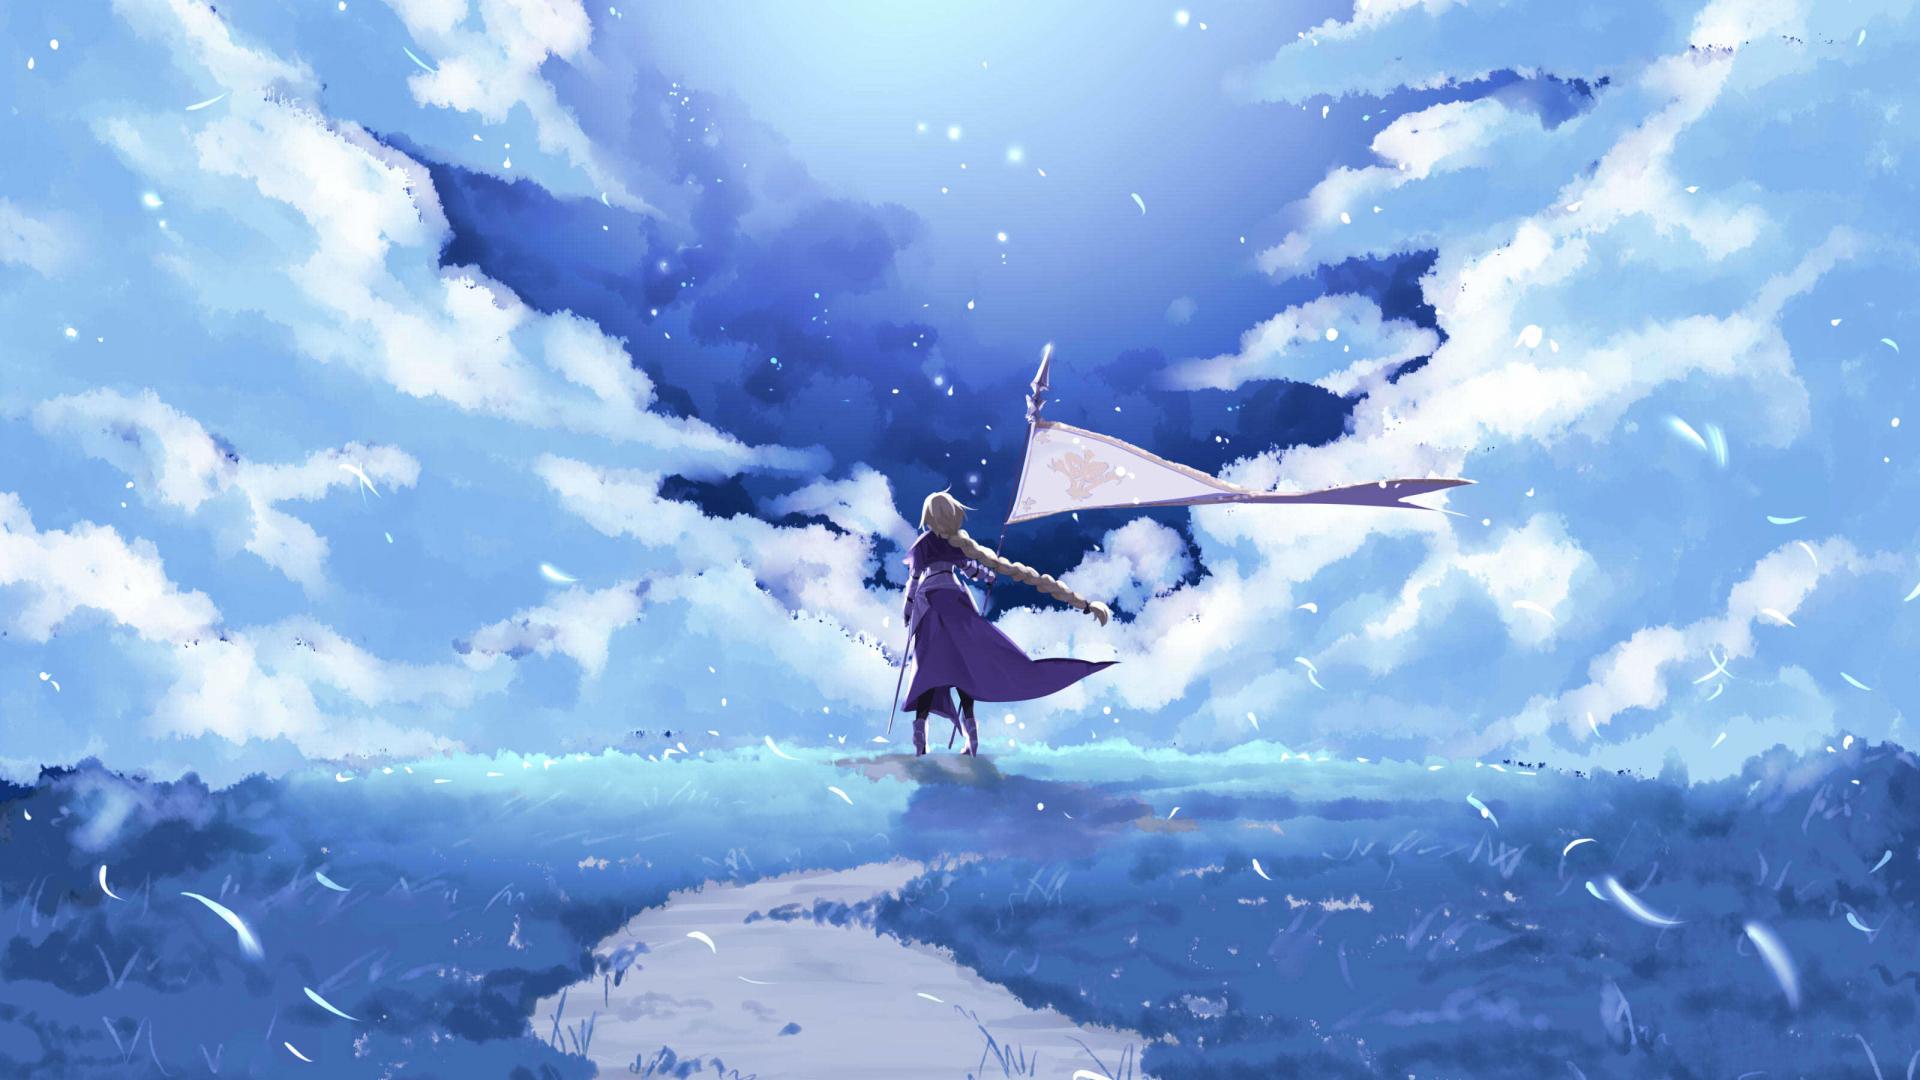 Download 1920x1080 Wallpaper Fate Grand Order Ruler Anime